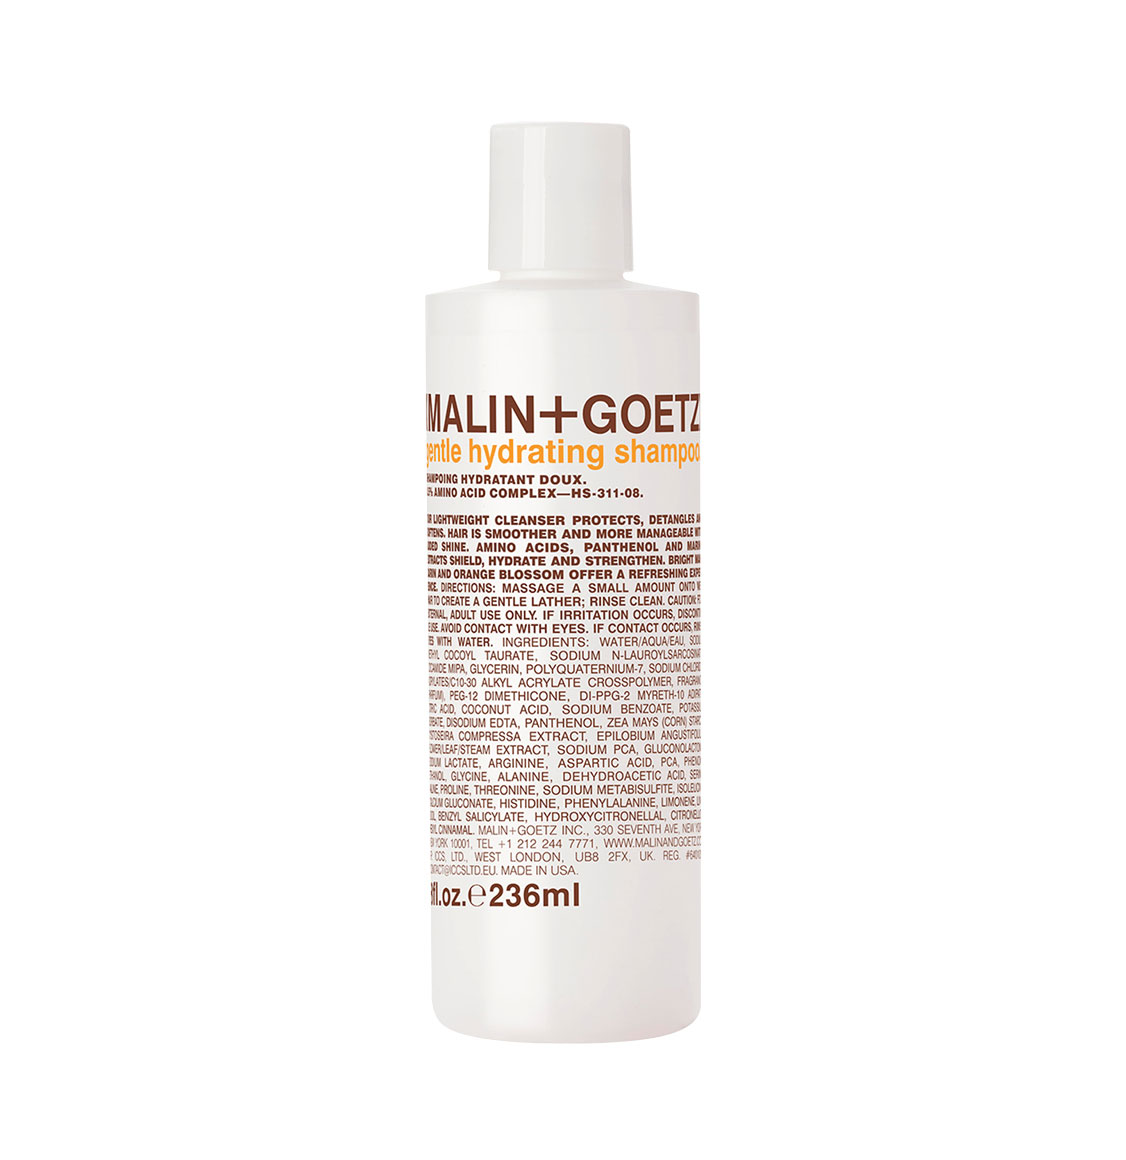 Malin and Goetz Gentle Hydrating Shampoo 236ml